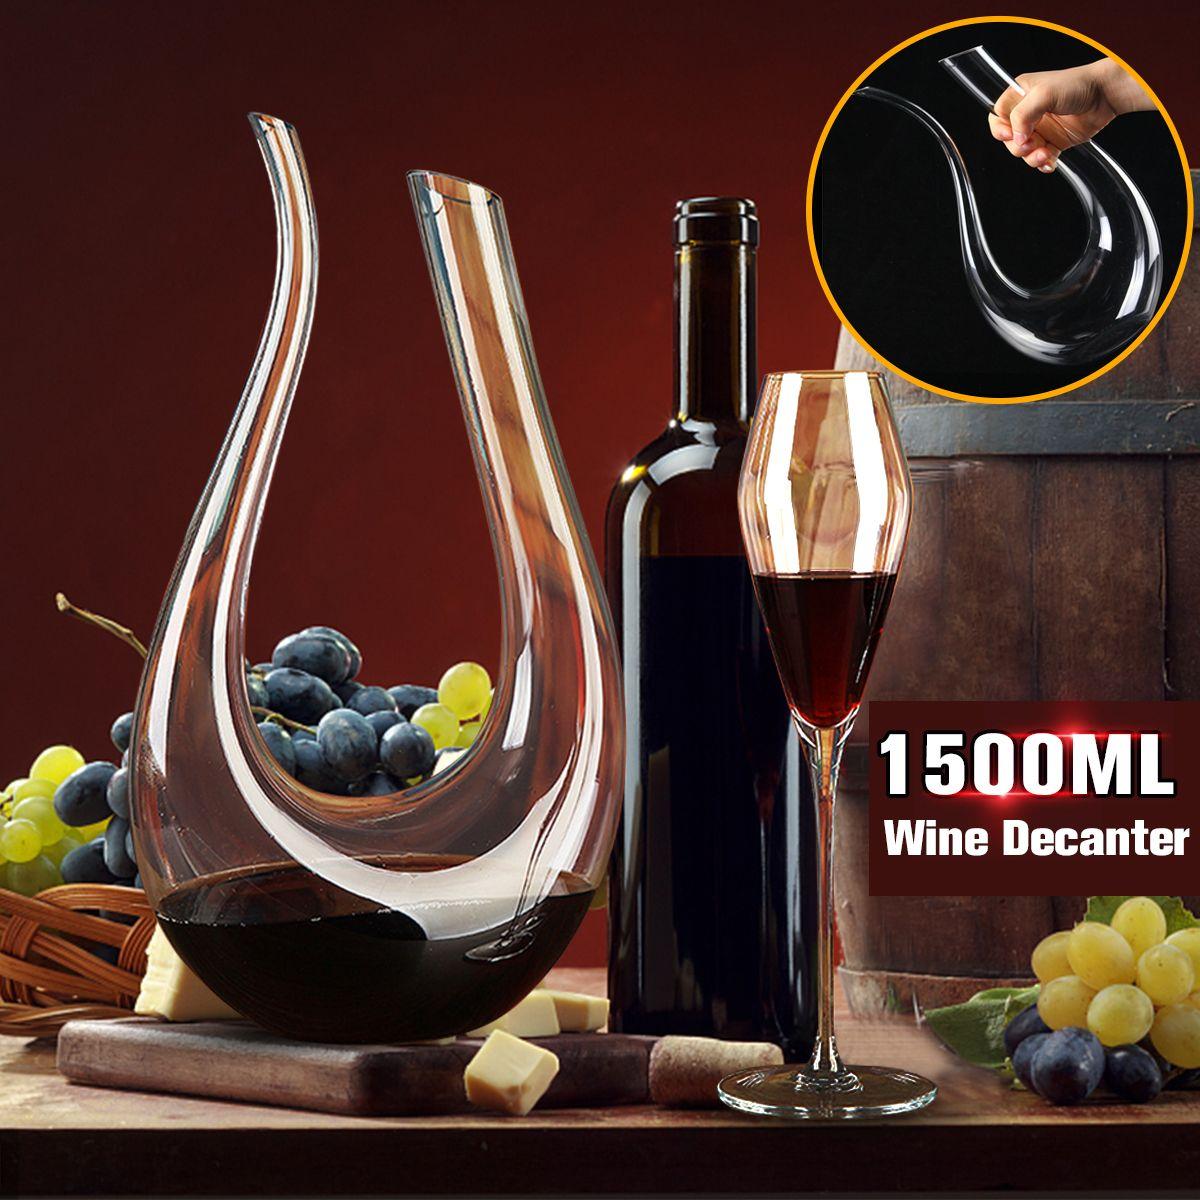 1500ml Crystal Glass Horn Red Big Wine Decanter Brandy Pourer Jug Wine Container Water Bottle Drinking Glasses Carafe Bar Set